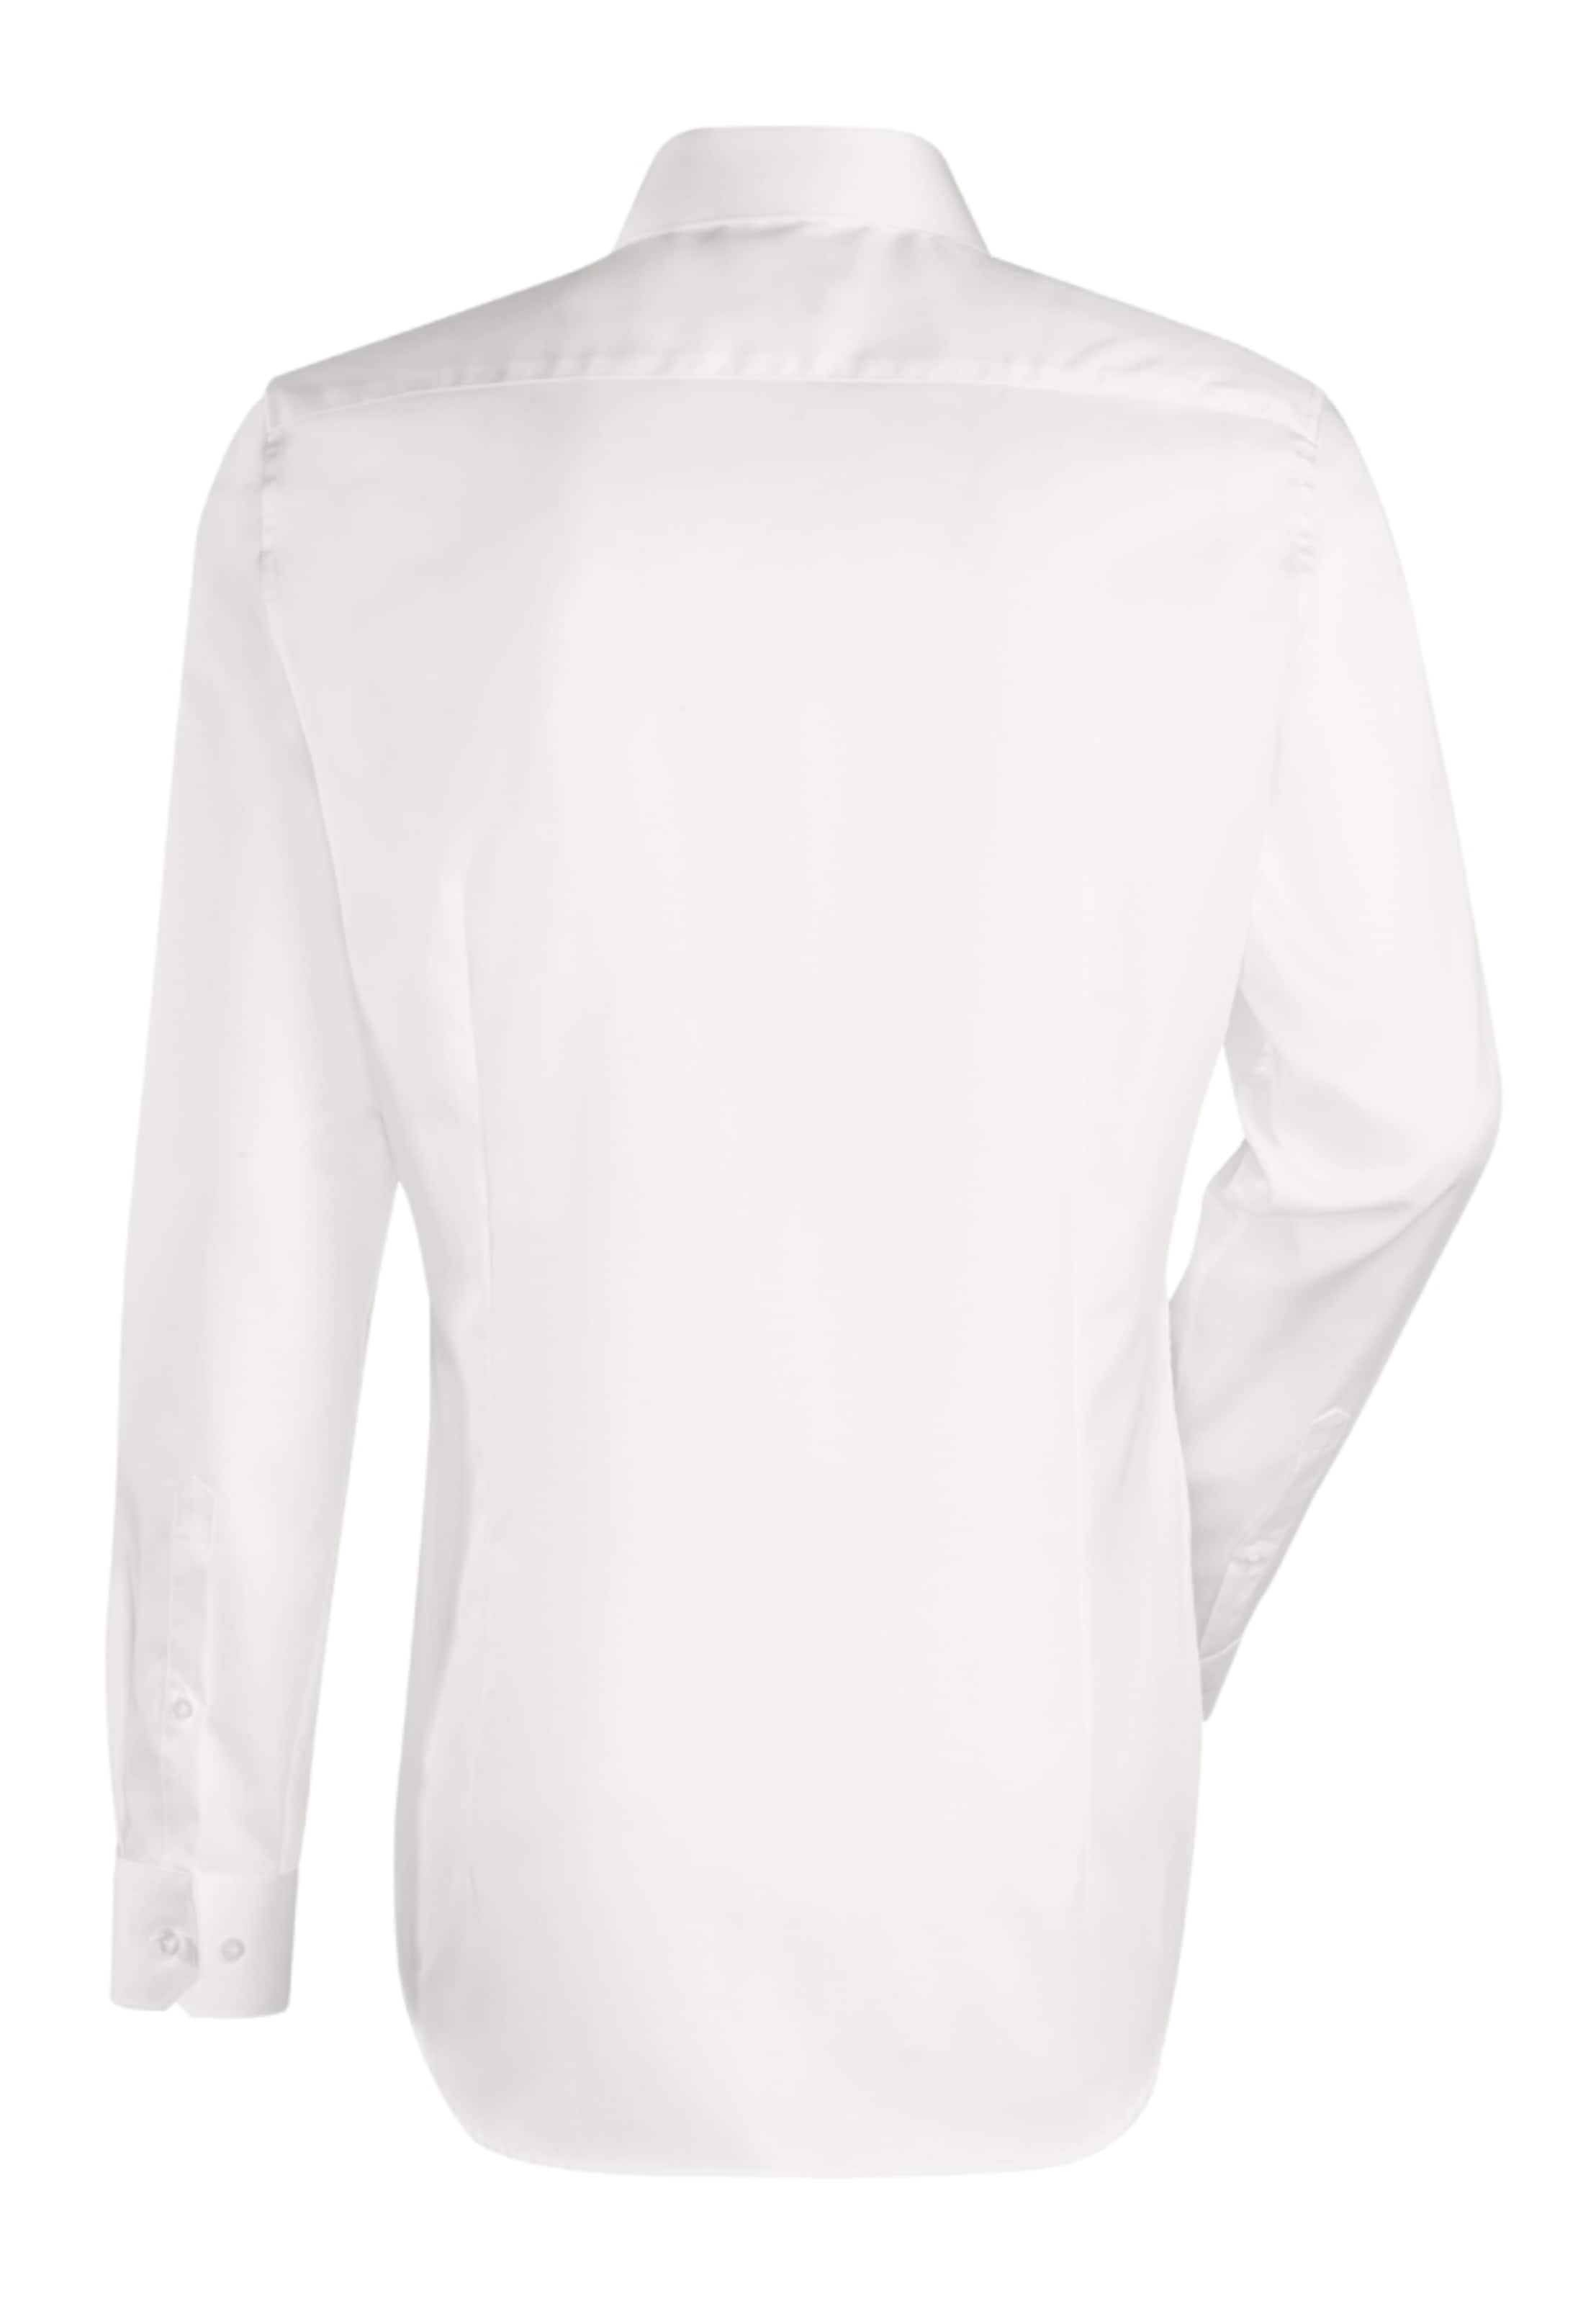 Custom Beige Fit City In hemd ' Britt Jacques kiuZPX